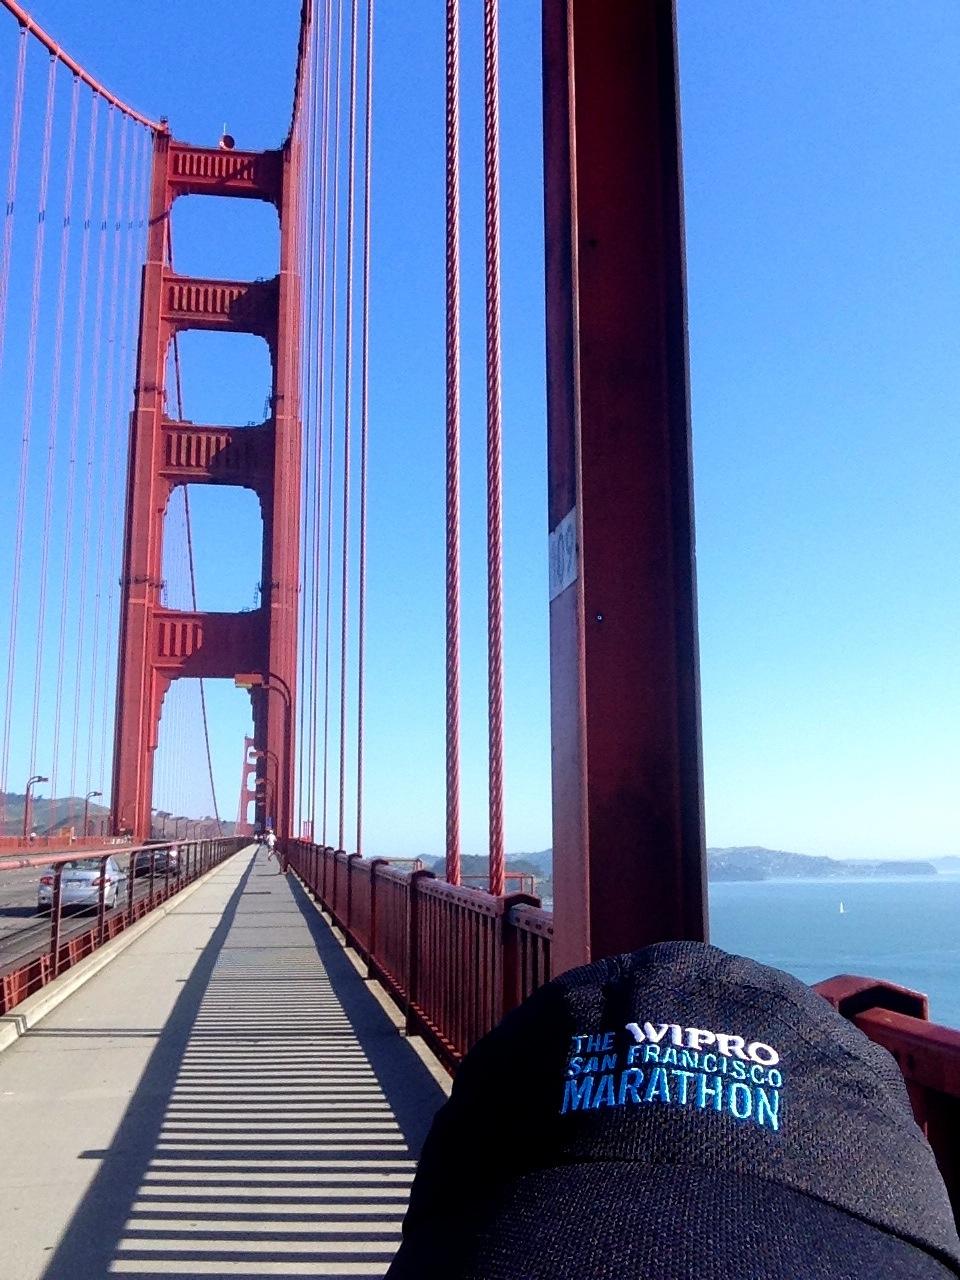 Sporting my new San Francisco Marathon hat on the GGB